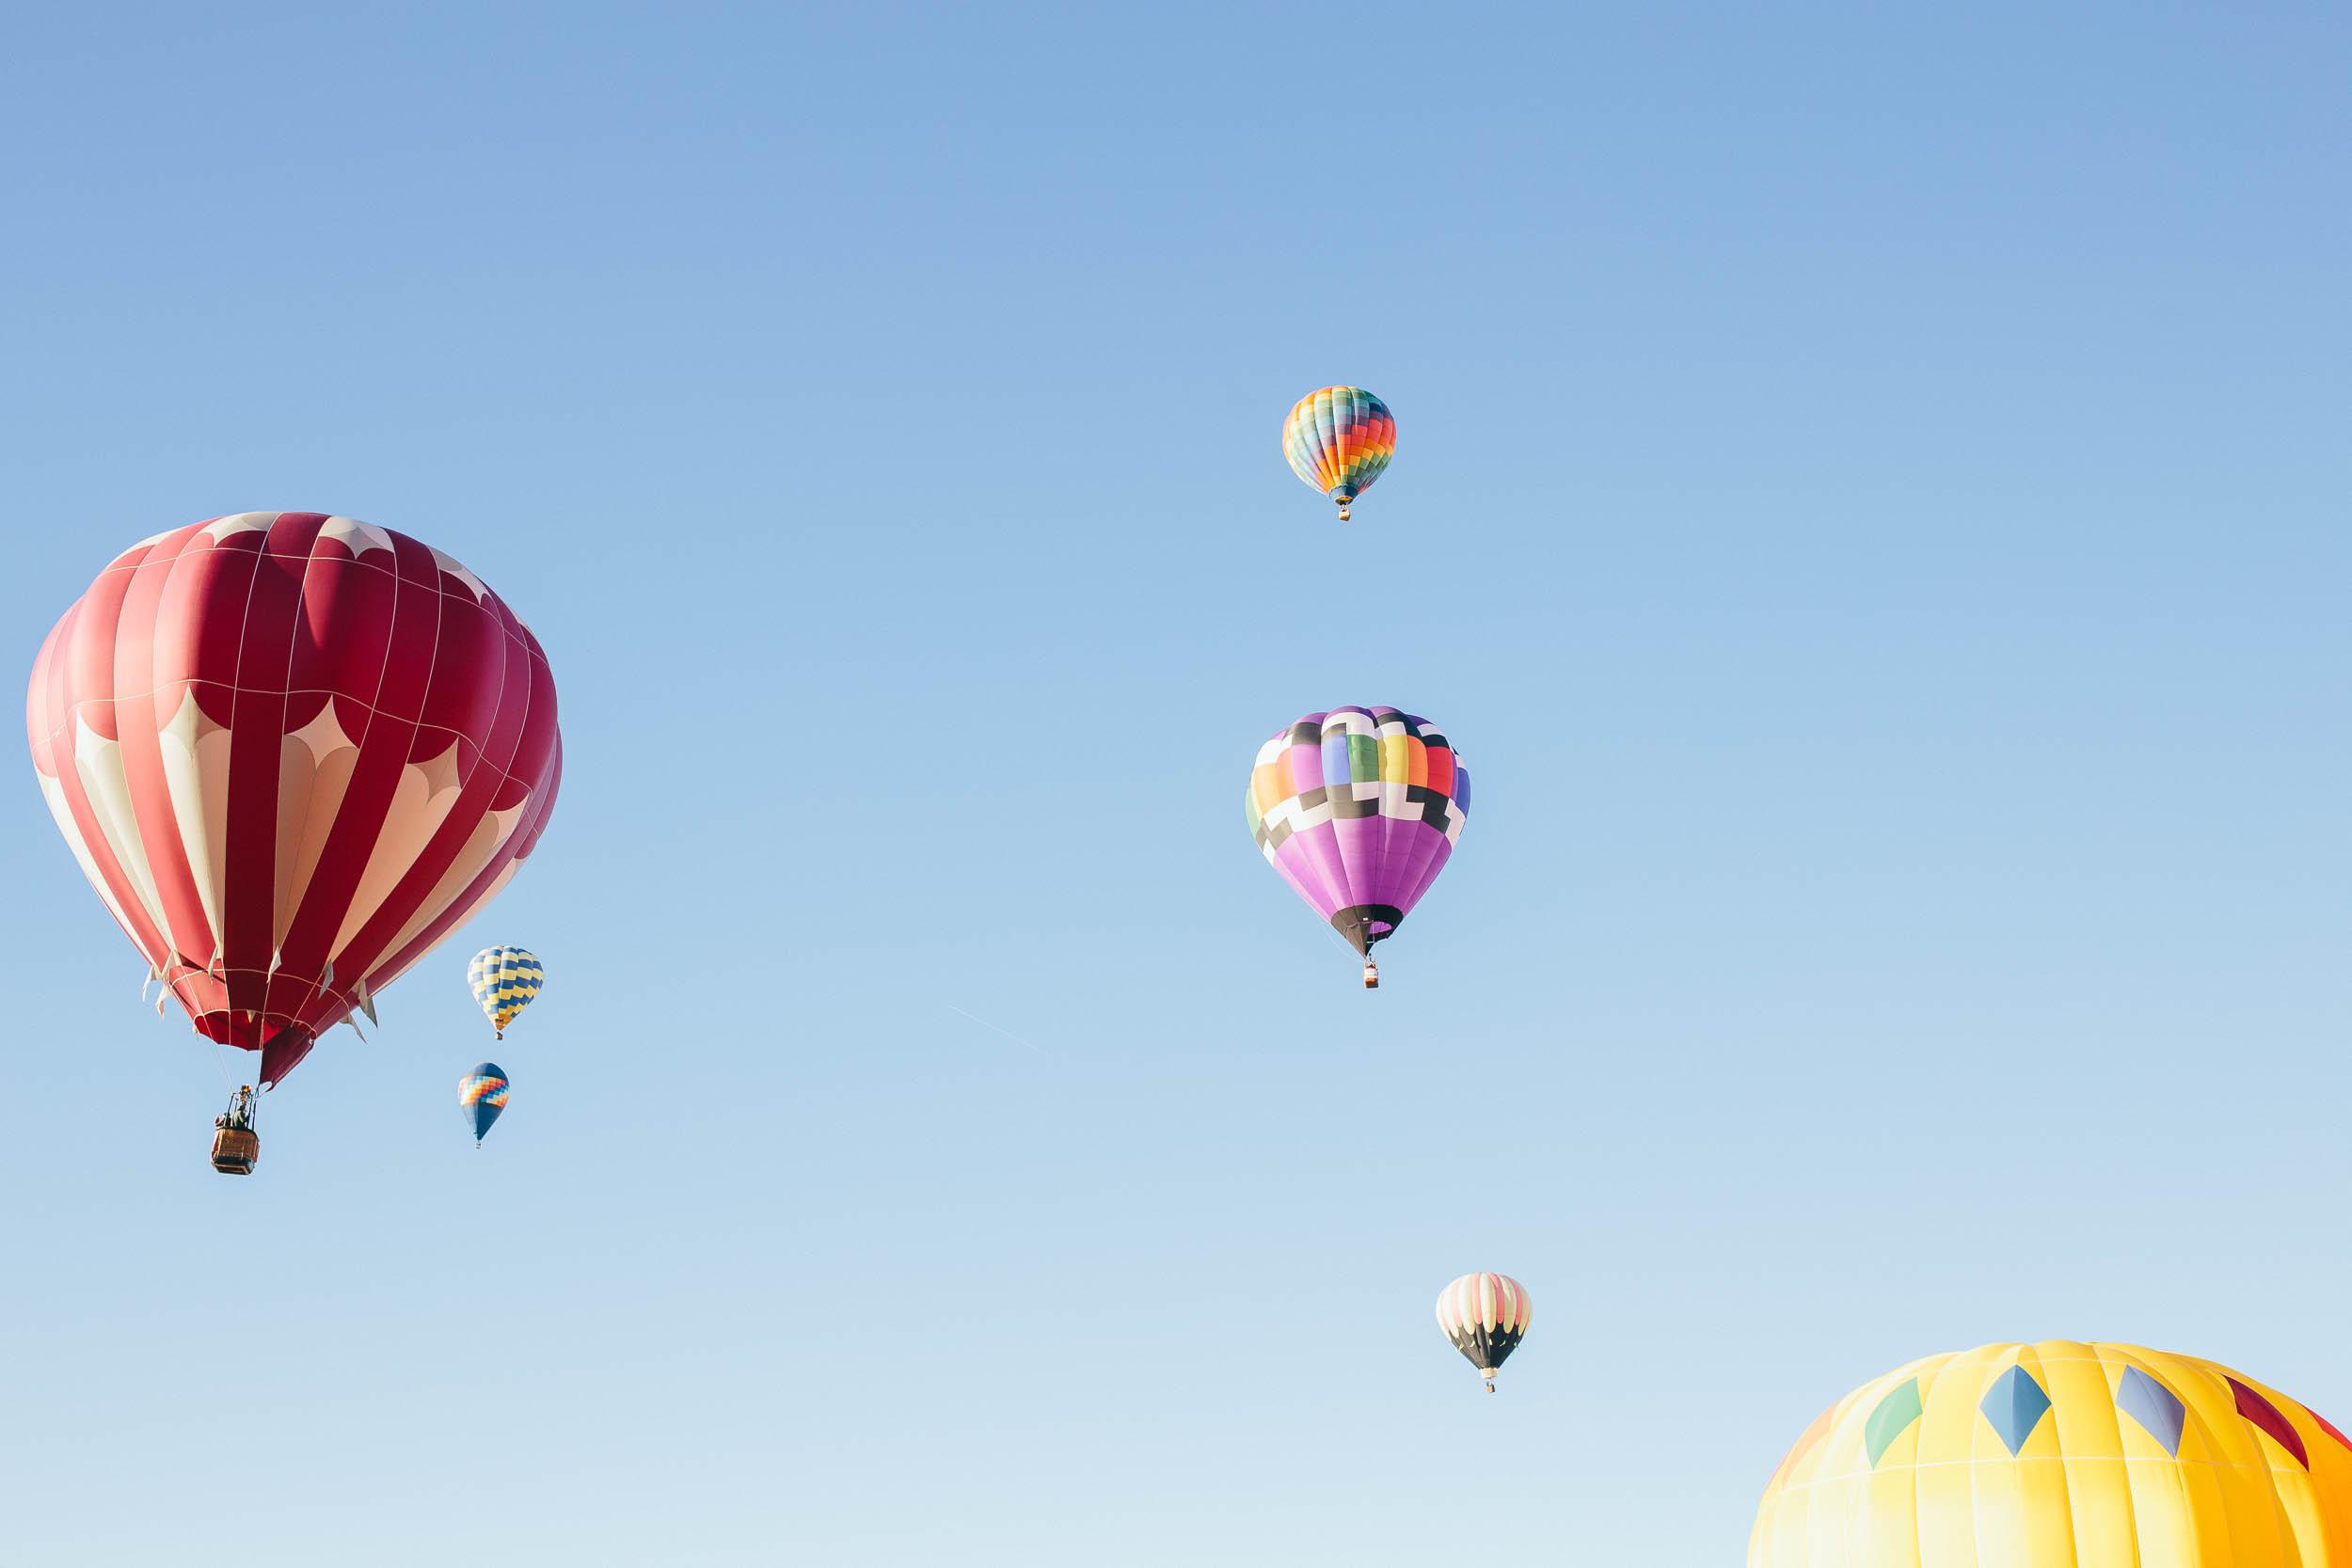 Kyle-Sheppard-Kanab-Balloon-Festival-17.jpg